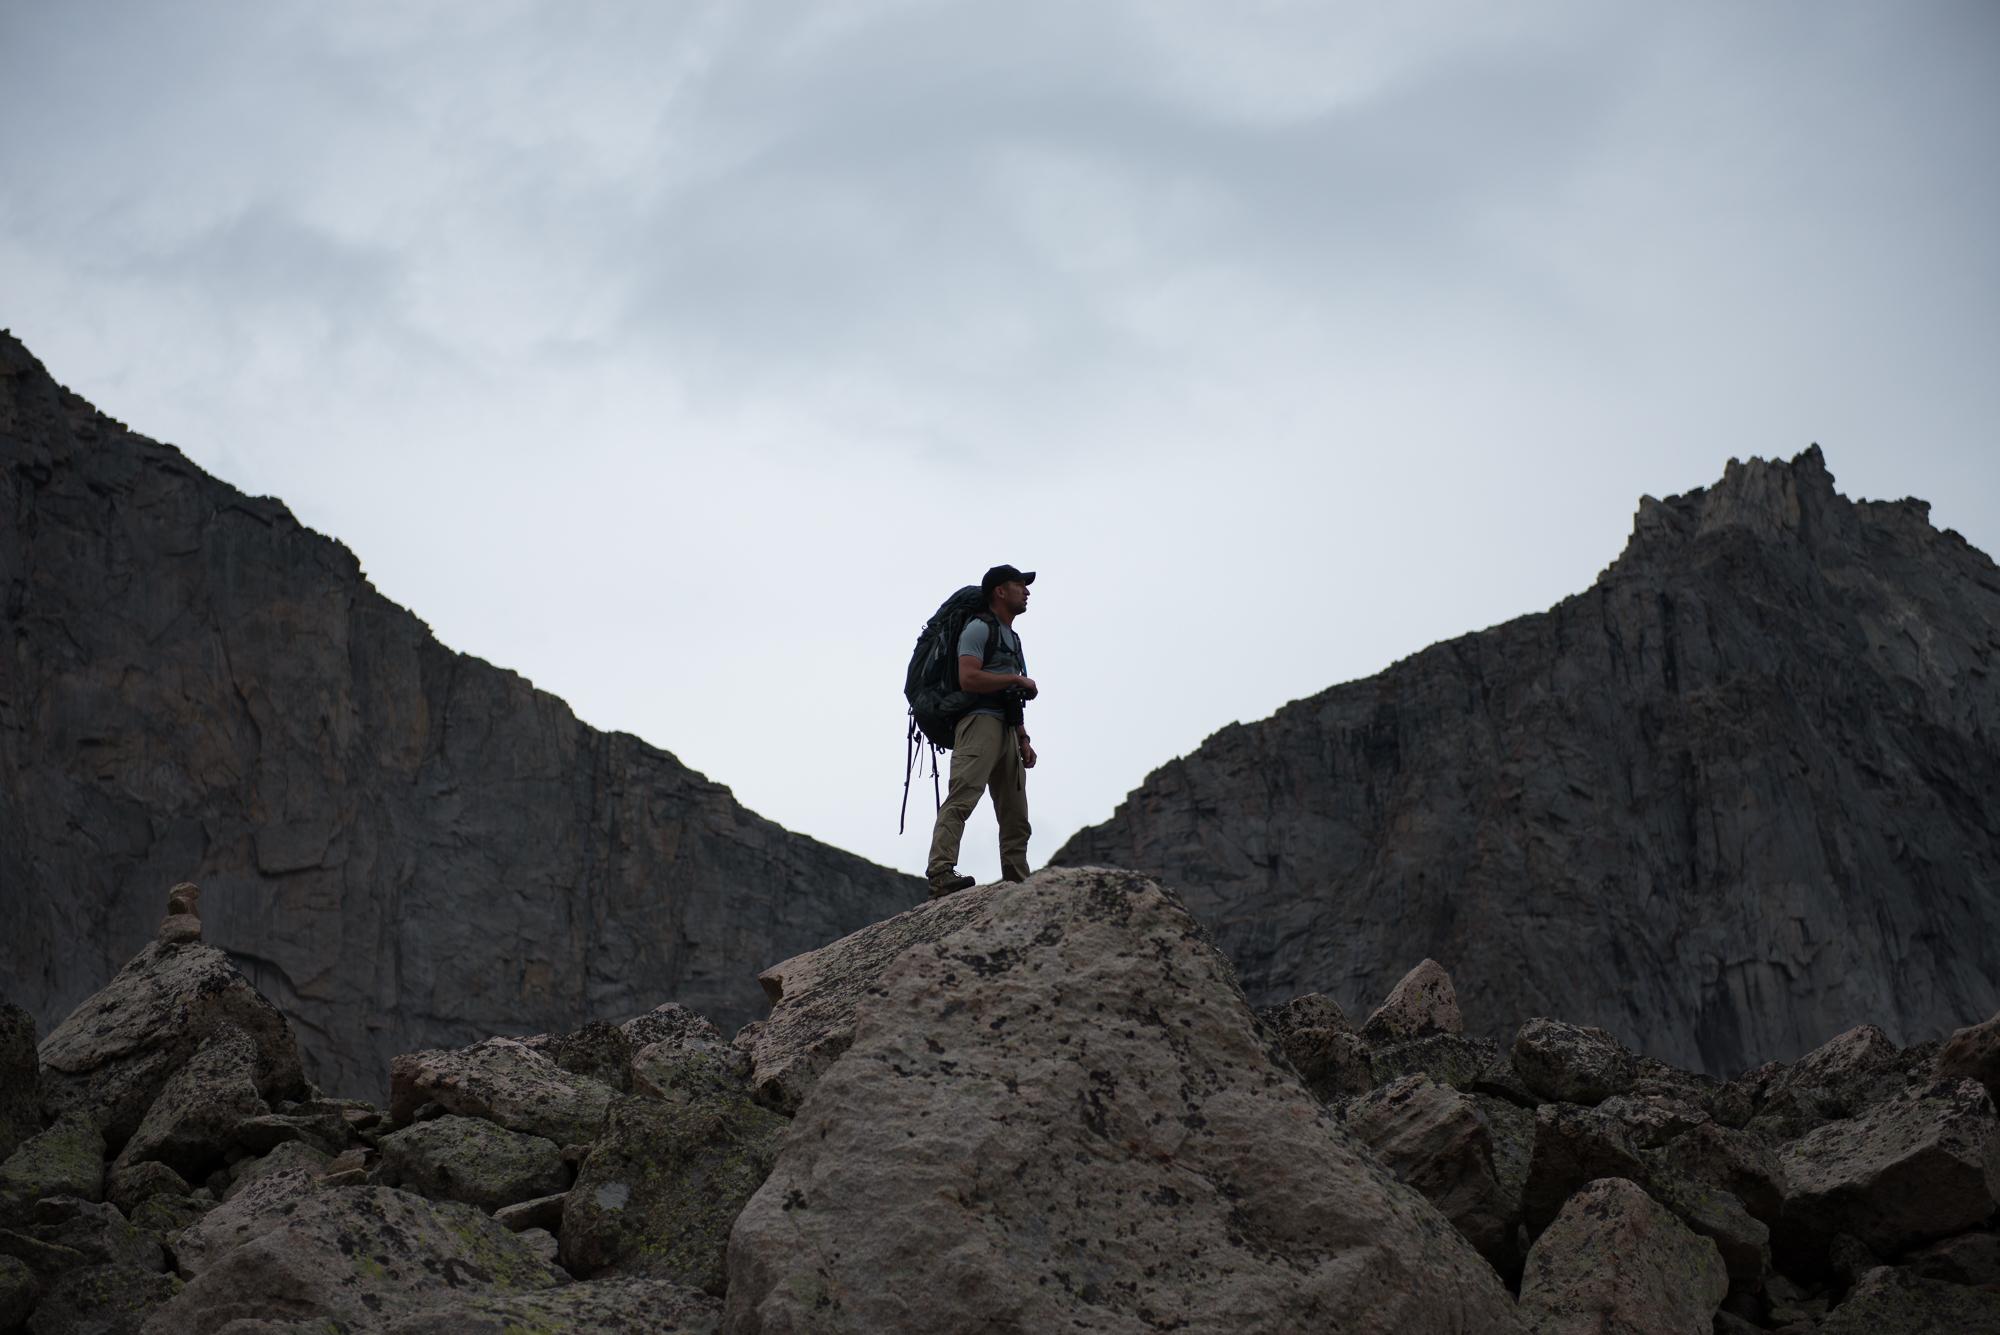 100814-mountain-adventure-mattrossphotography-10.jpg